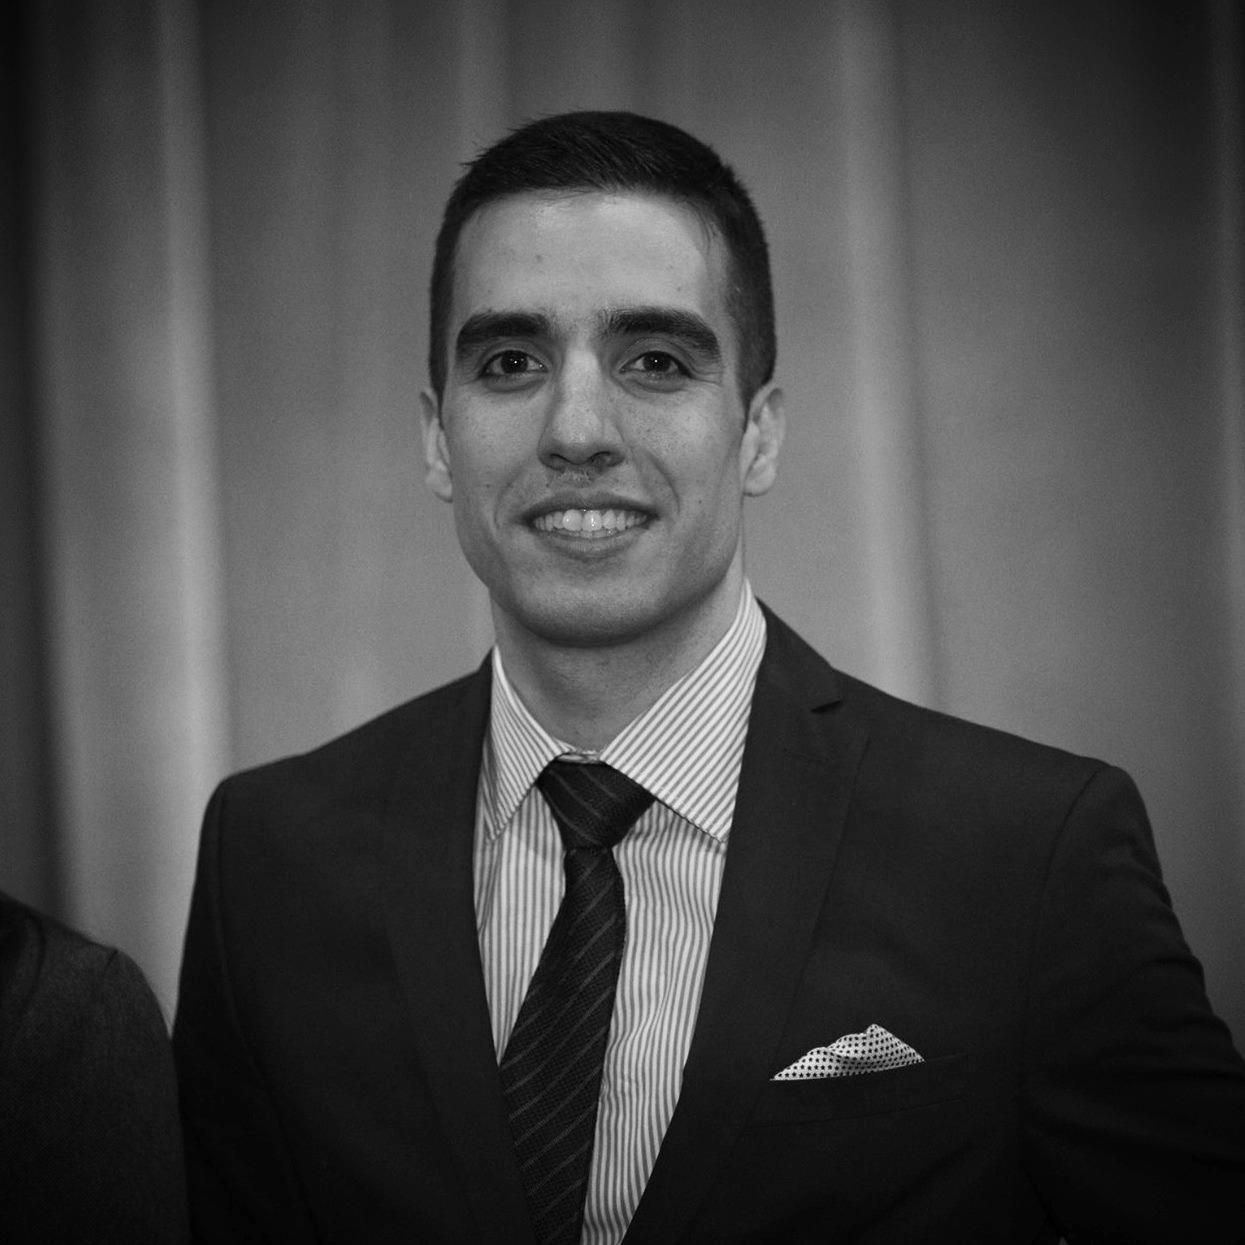 Omid Sadeghi, B.Eng., MBA - EXECUTIVE DIRECTORomid@theblockchainhub.com